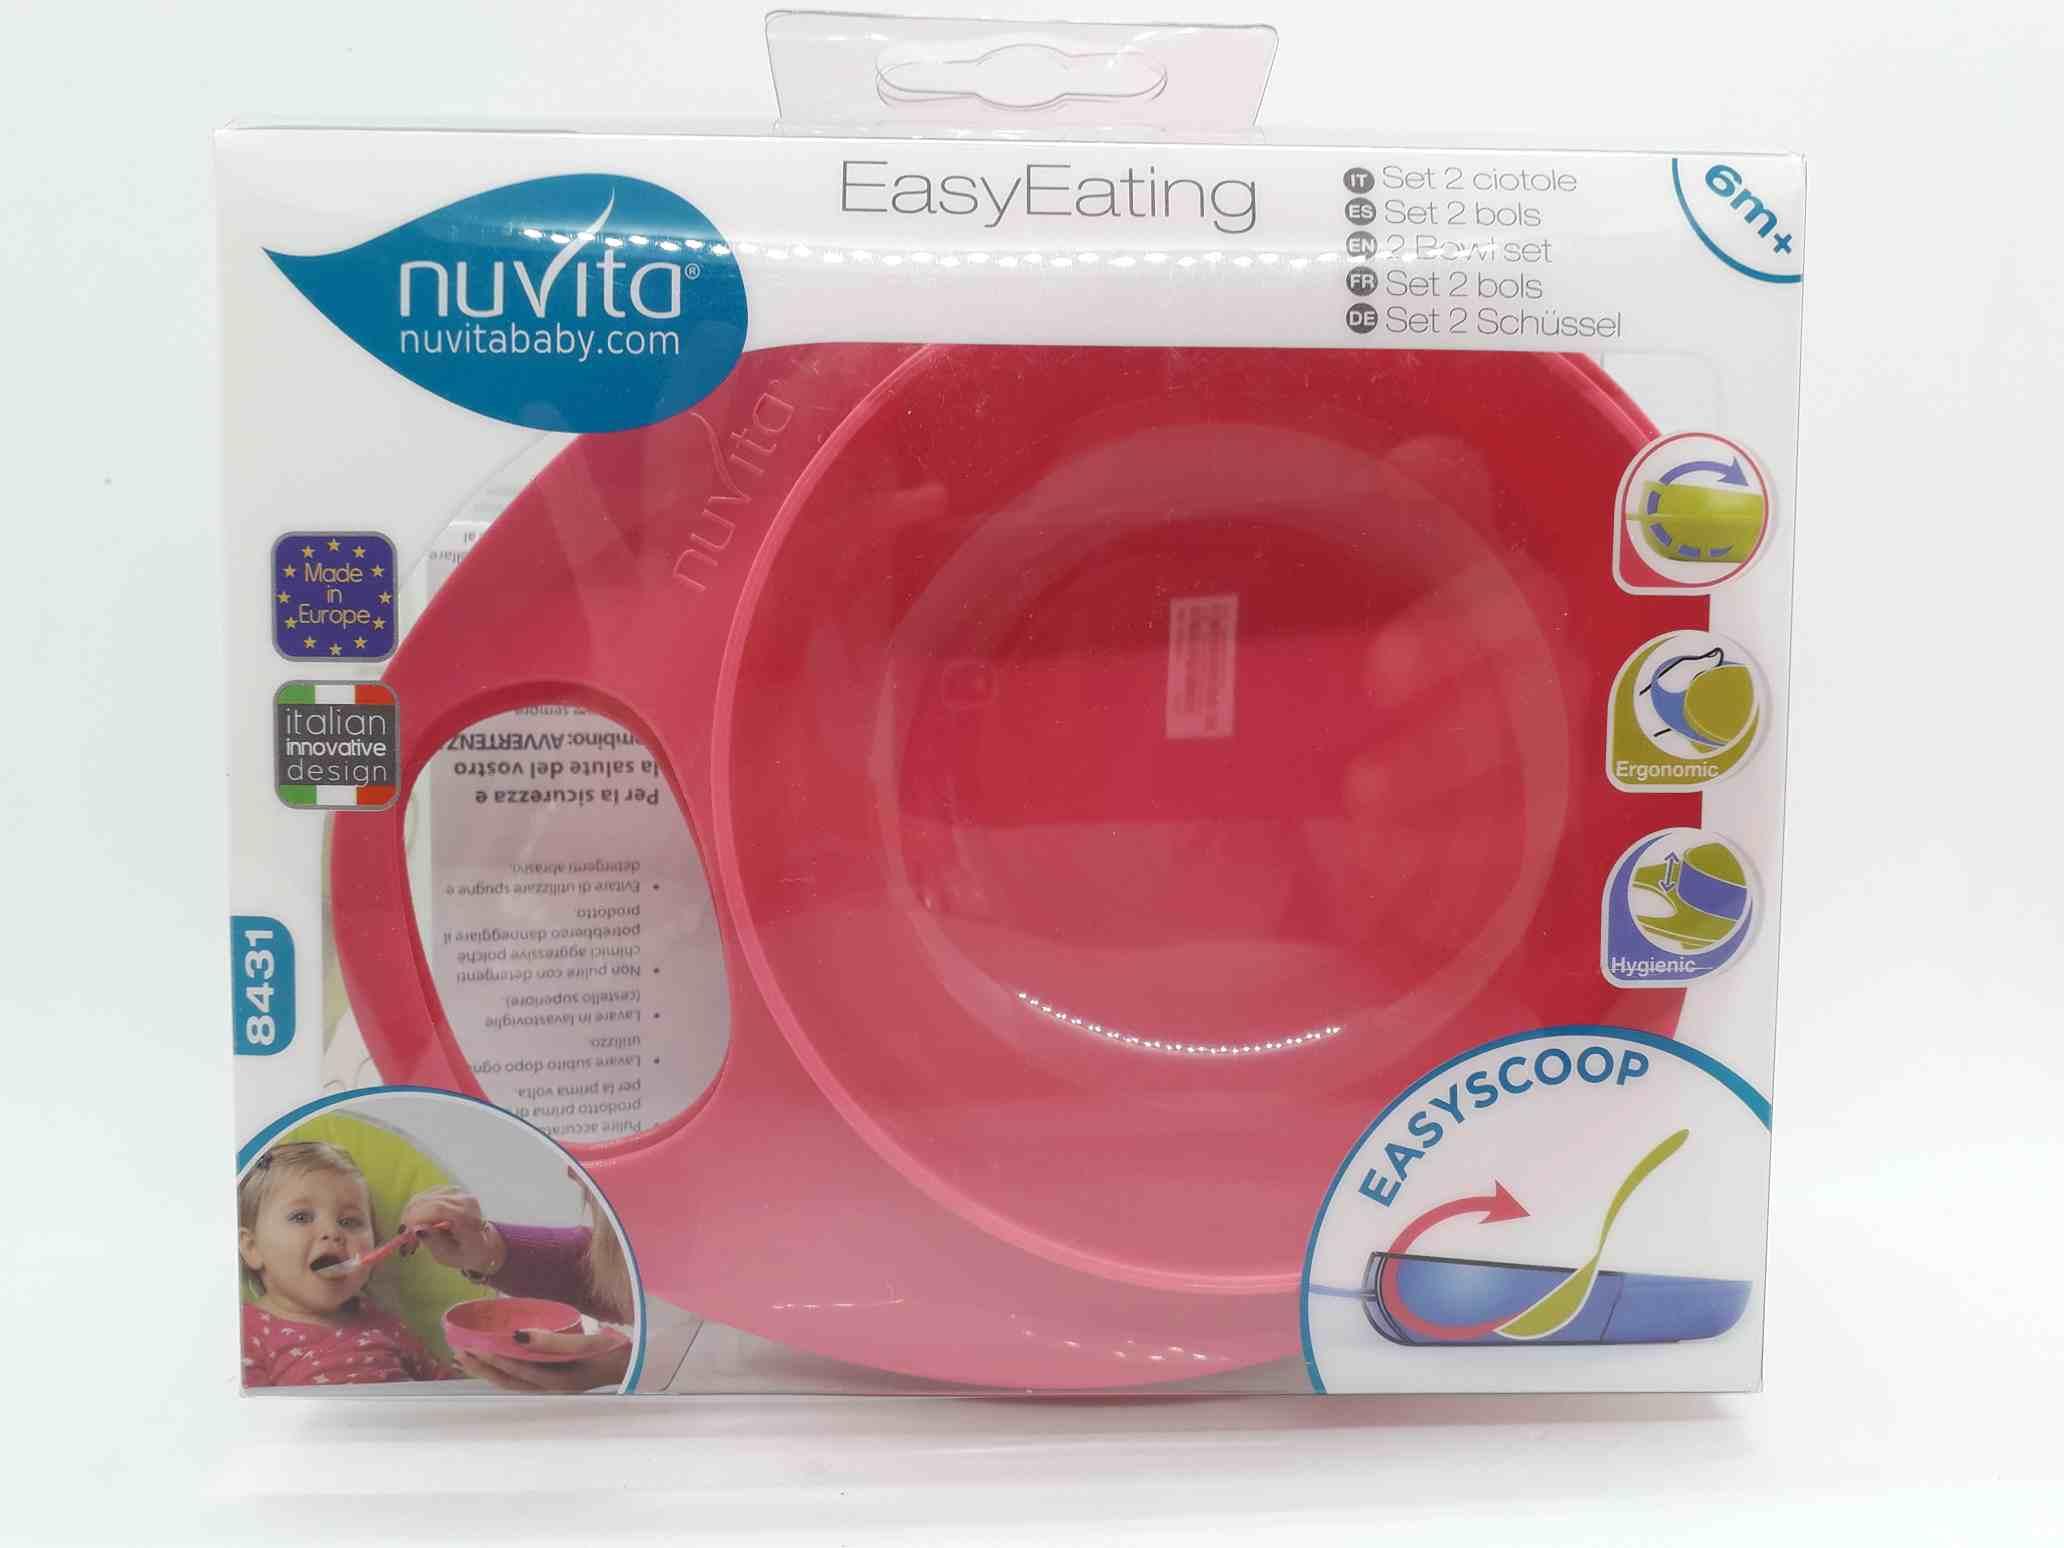 NUVITA CIOTOLA EASY EATING ROSA - Farmaciaempatica.it